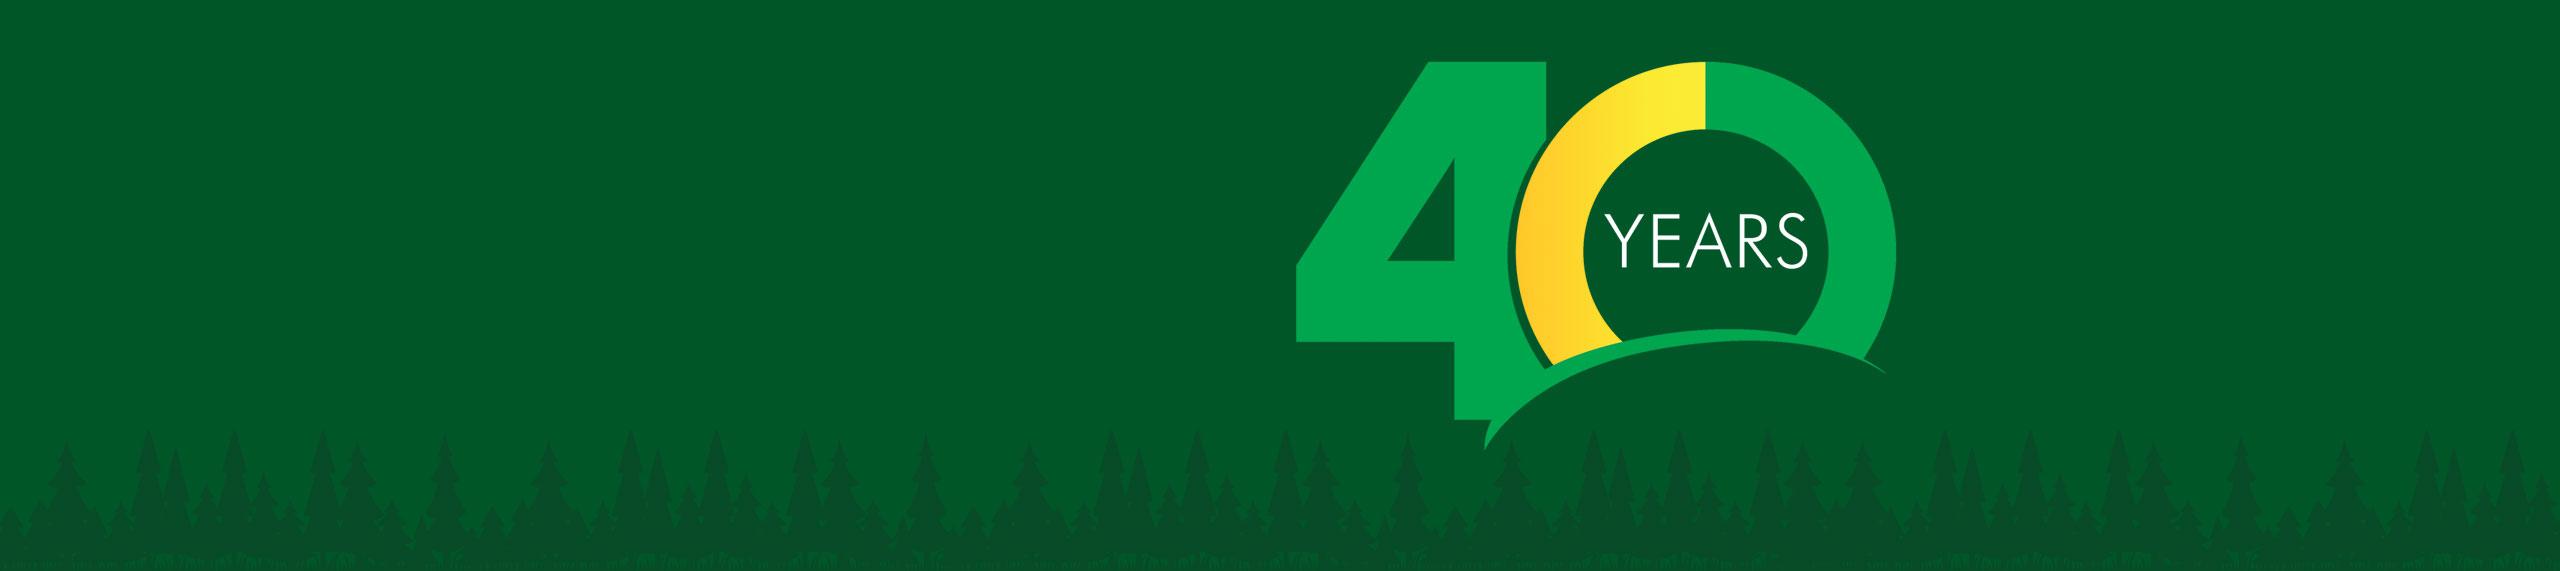 FCBE 40 Years